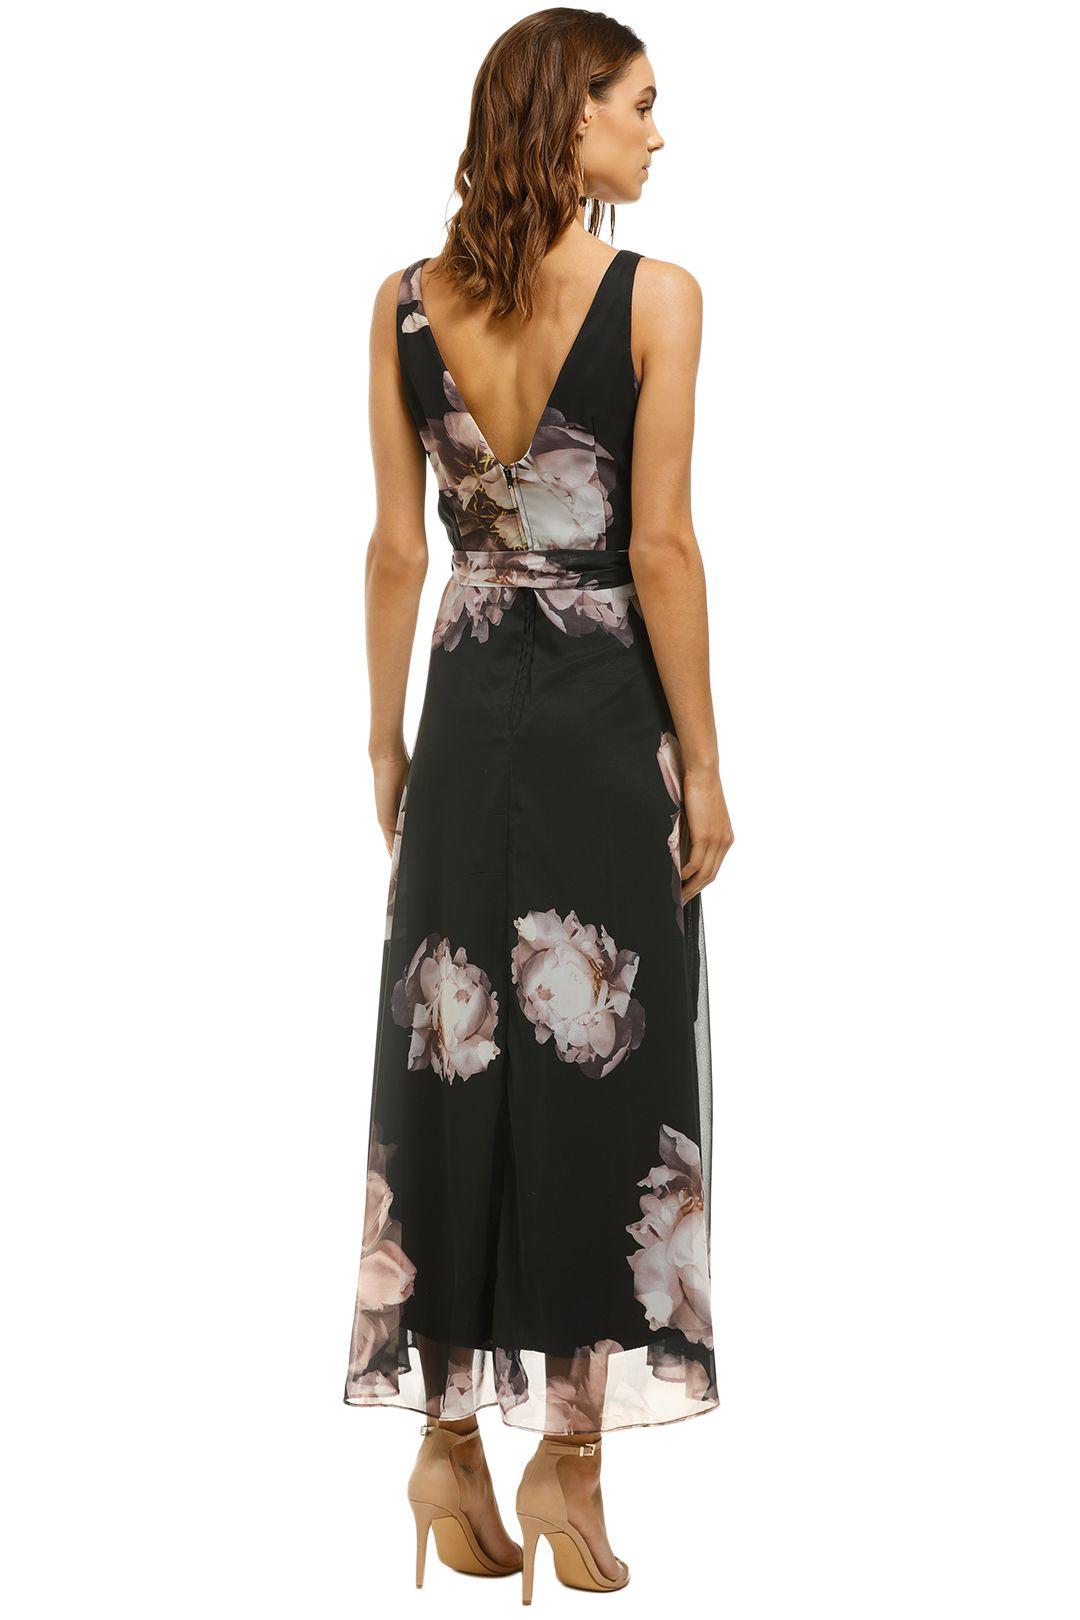 Montique-Rosie-Black-Print-Chiffon-Dress-Black-Floral-Back